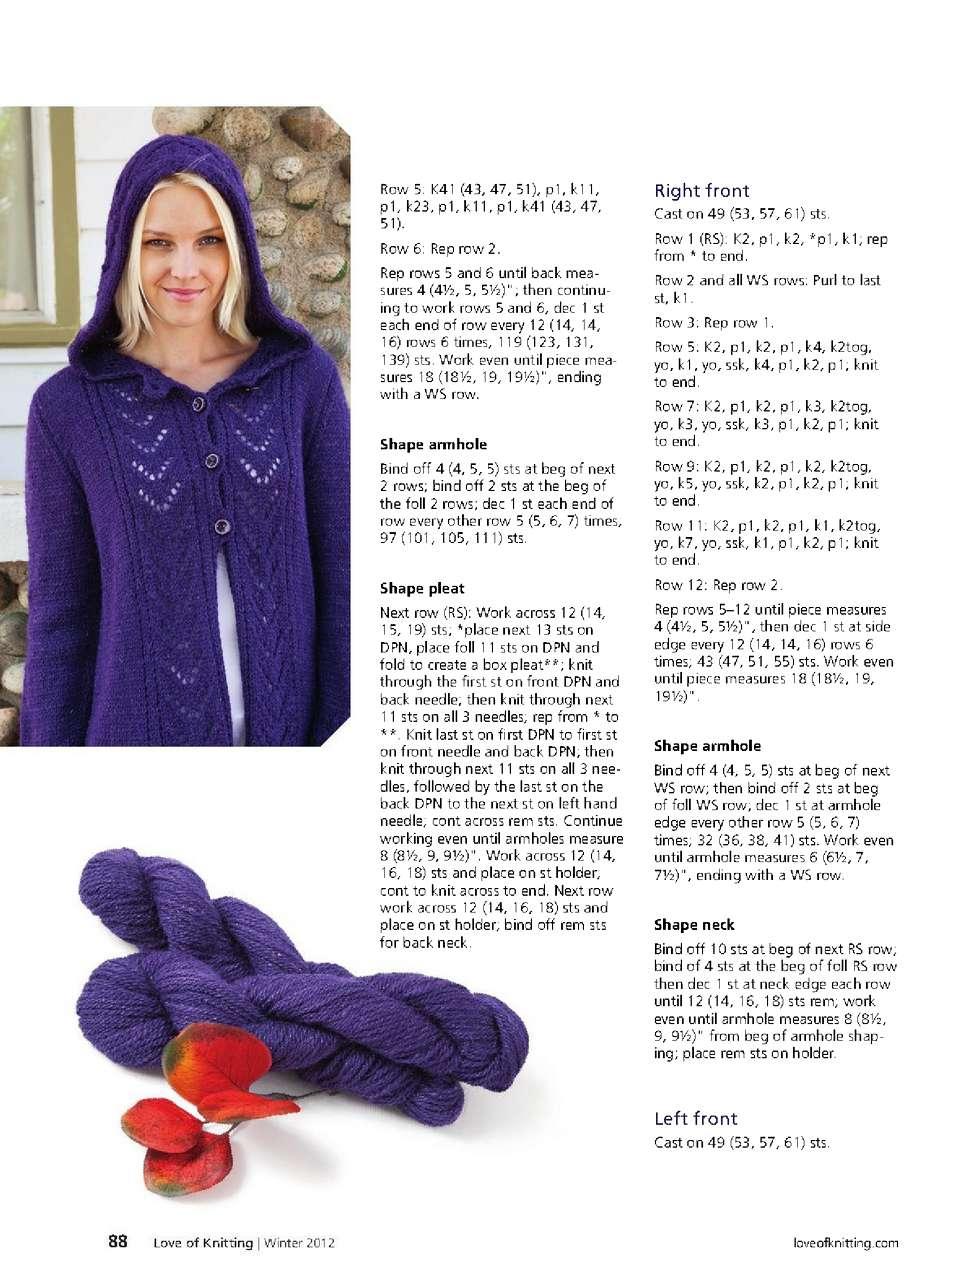 love-of-knitting-winter-2012